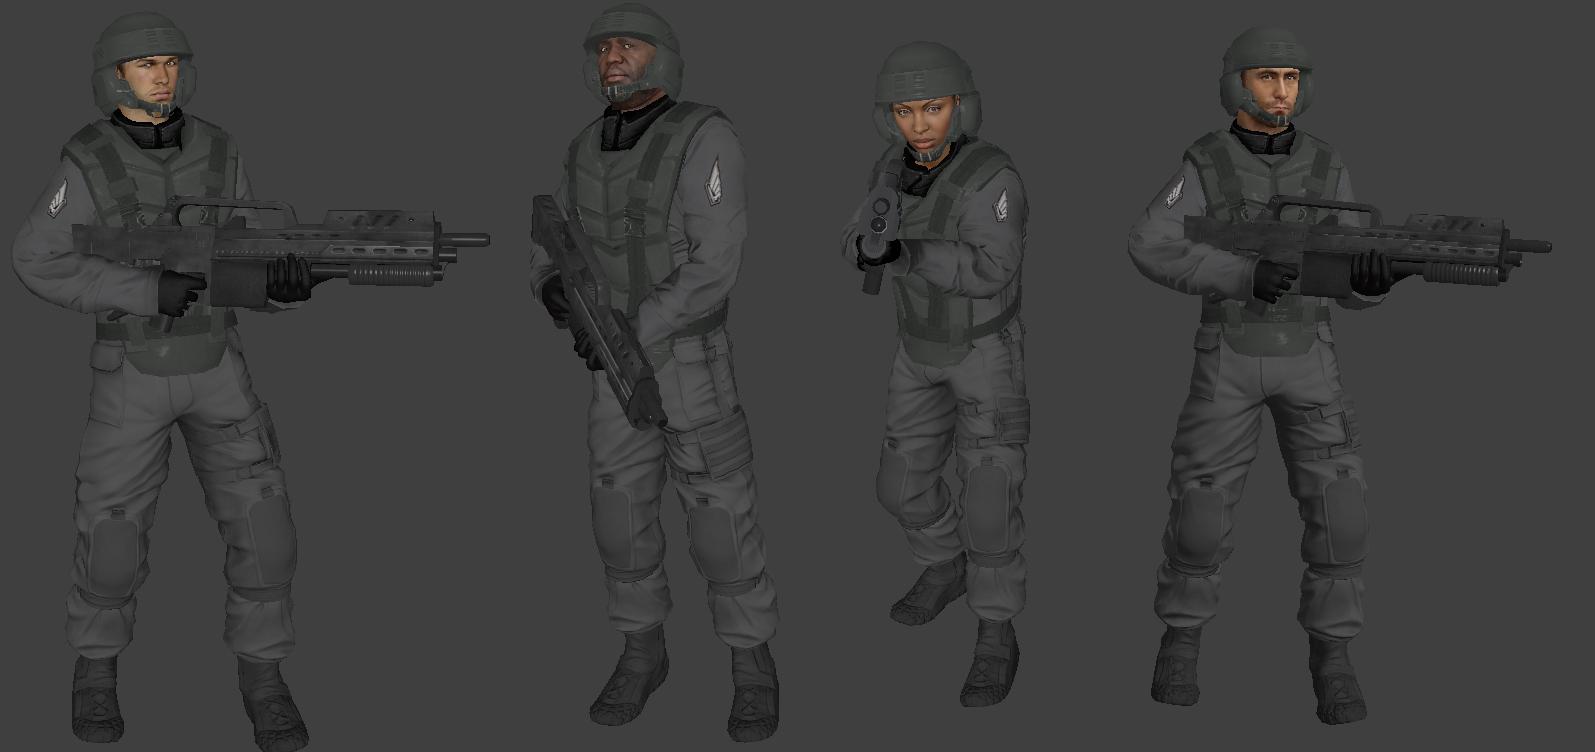 L4D2 Starship Troopers mod for Left 4 Dead 2 - Mod DB